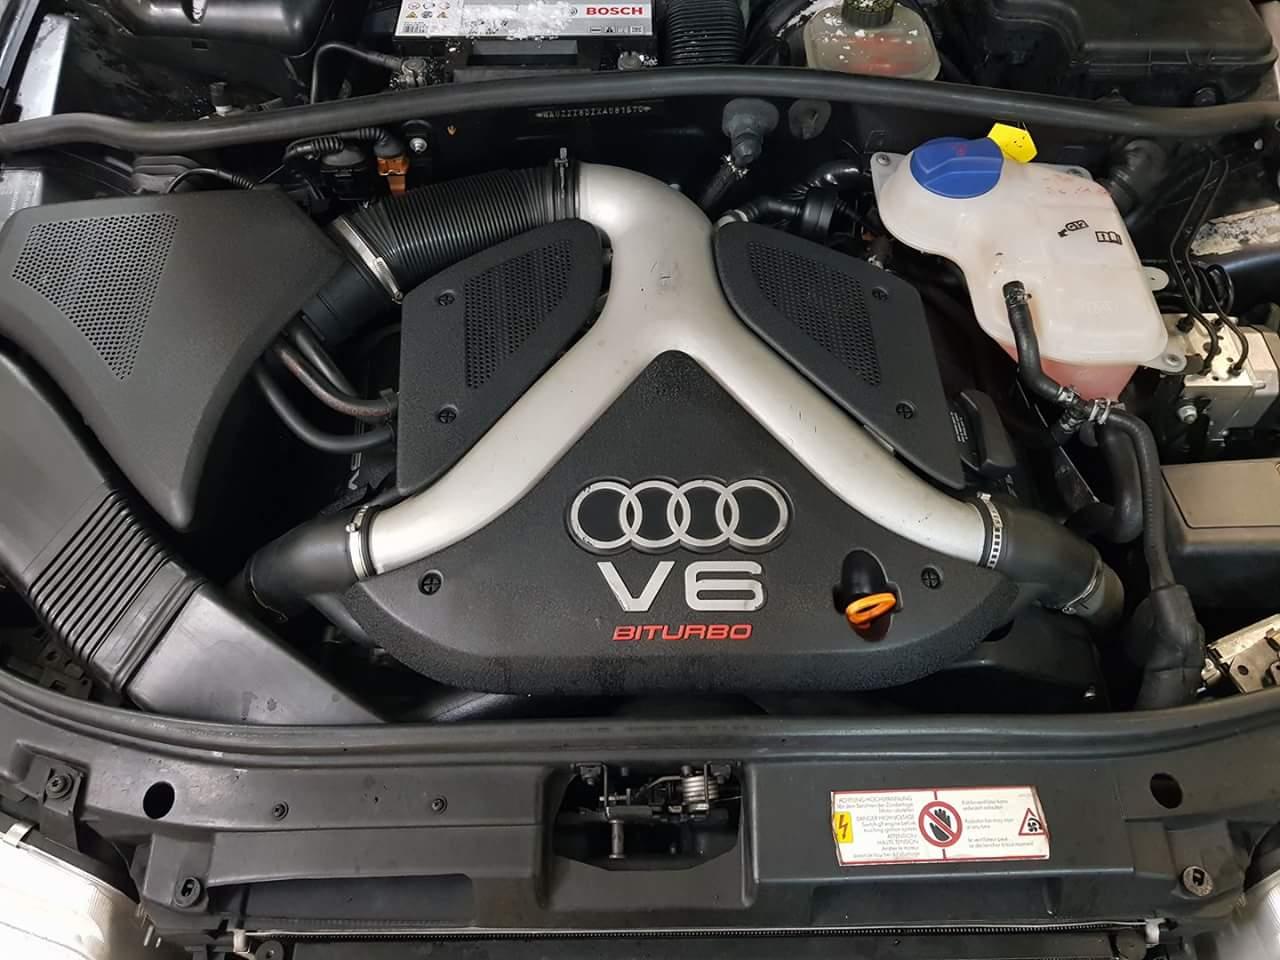 Audi S4 B5 - 2.7 V6 BiTURBO - 265 PS - Stufe 2